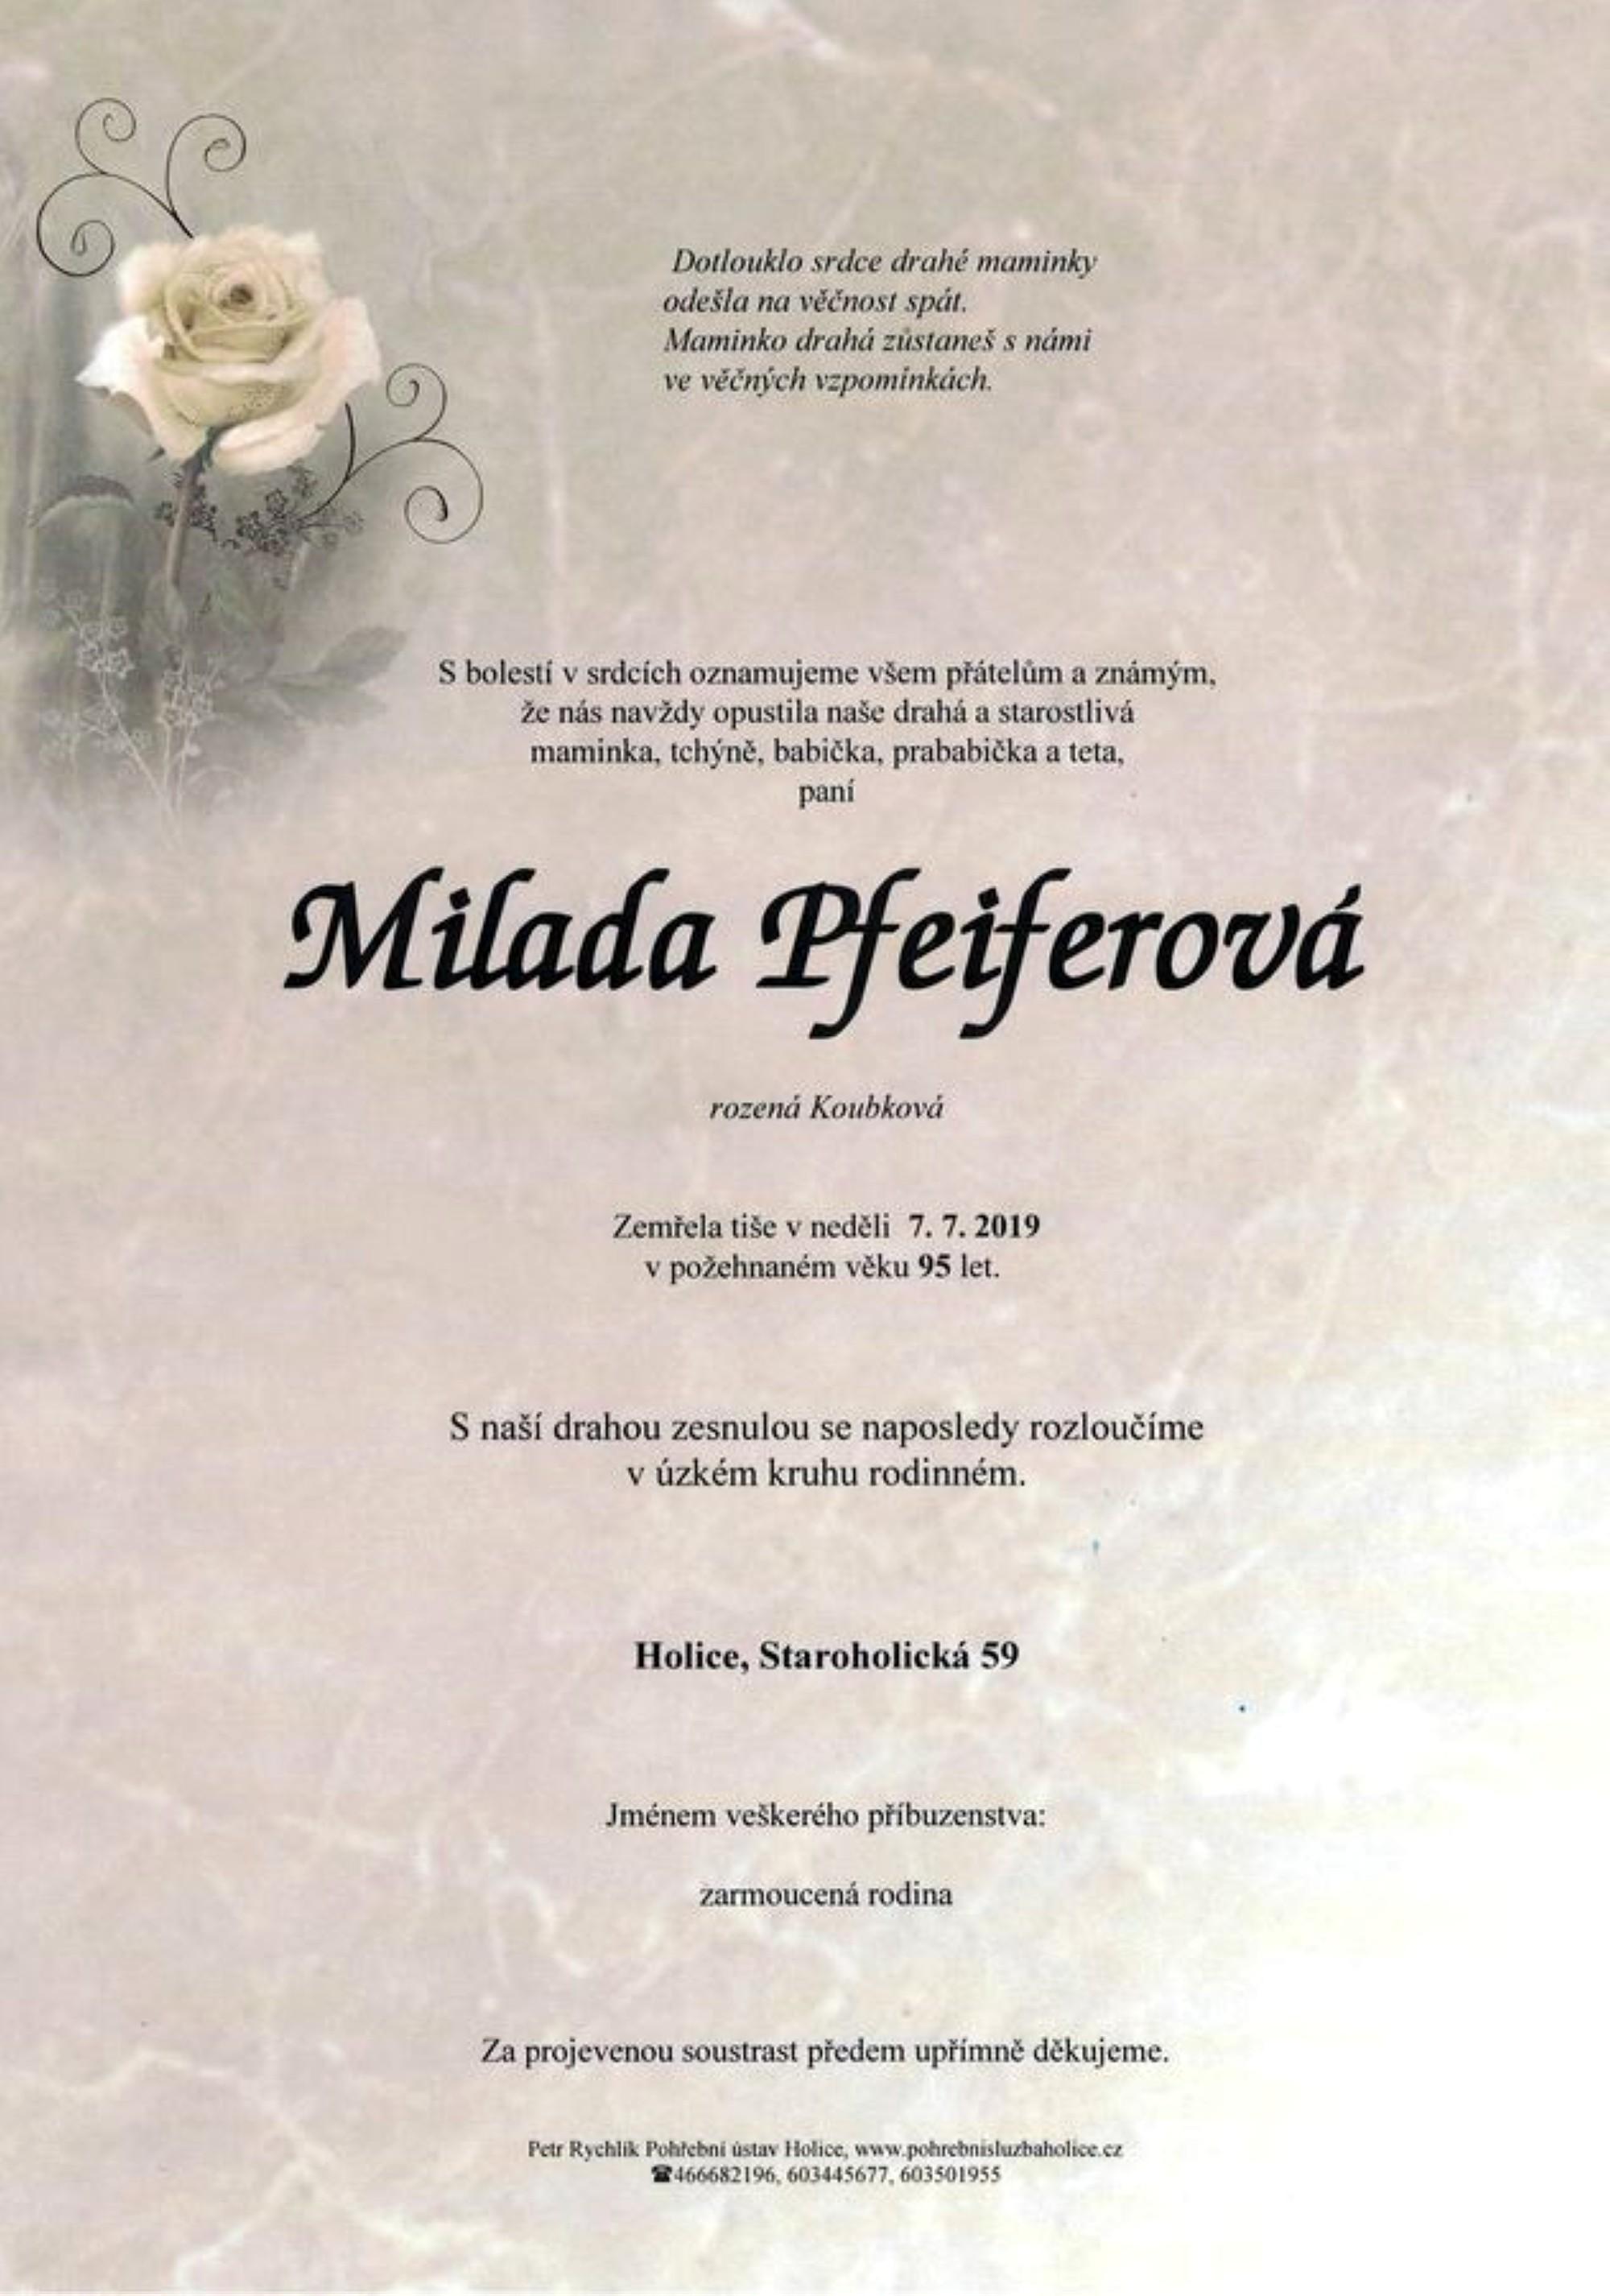 Milada Pfeiferová